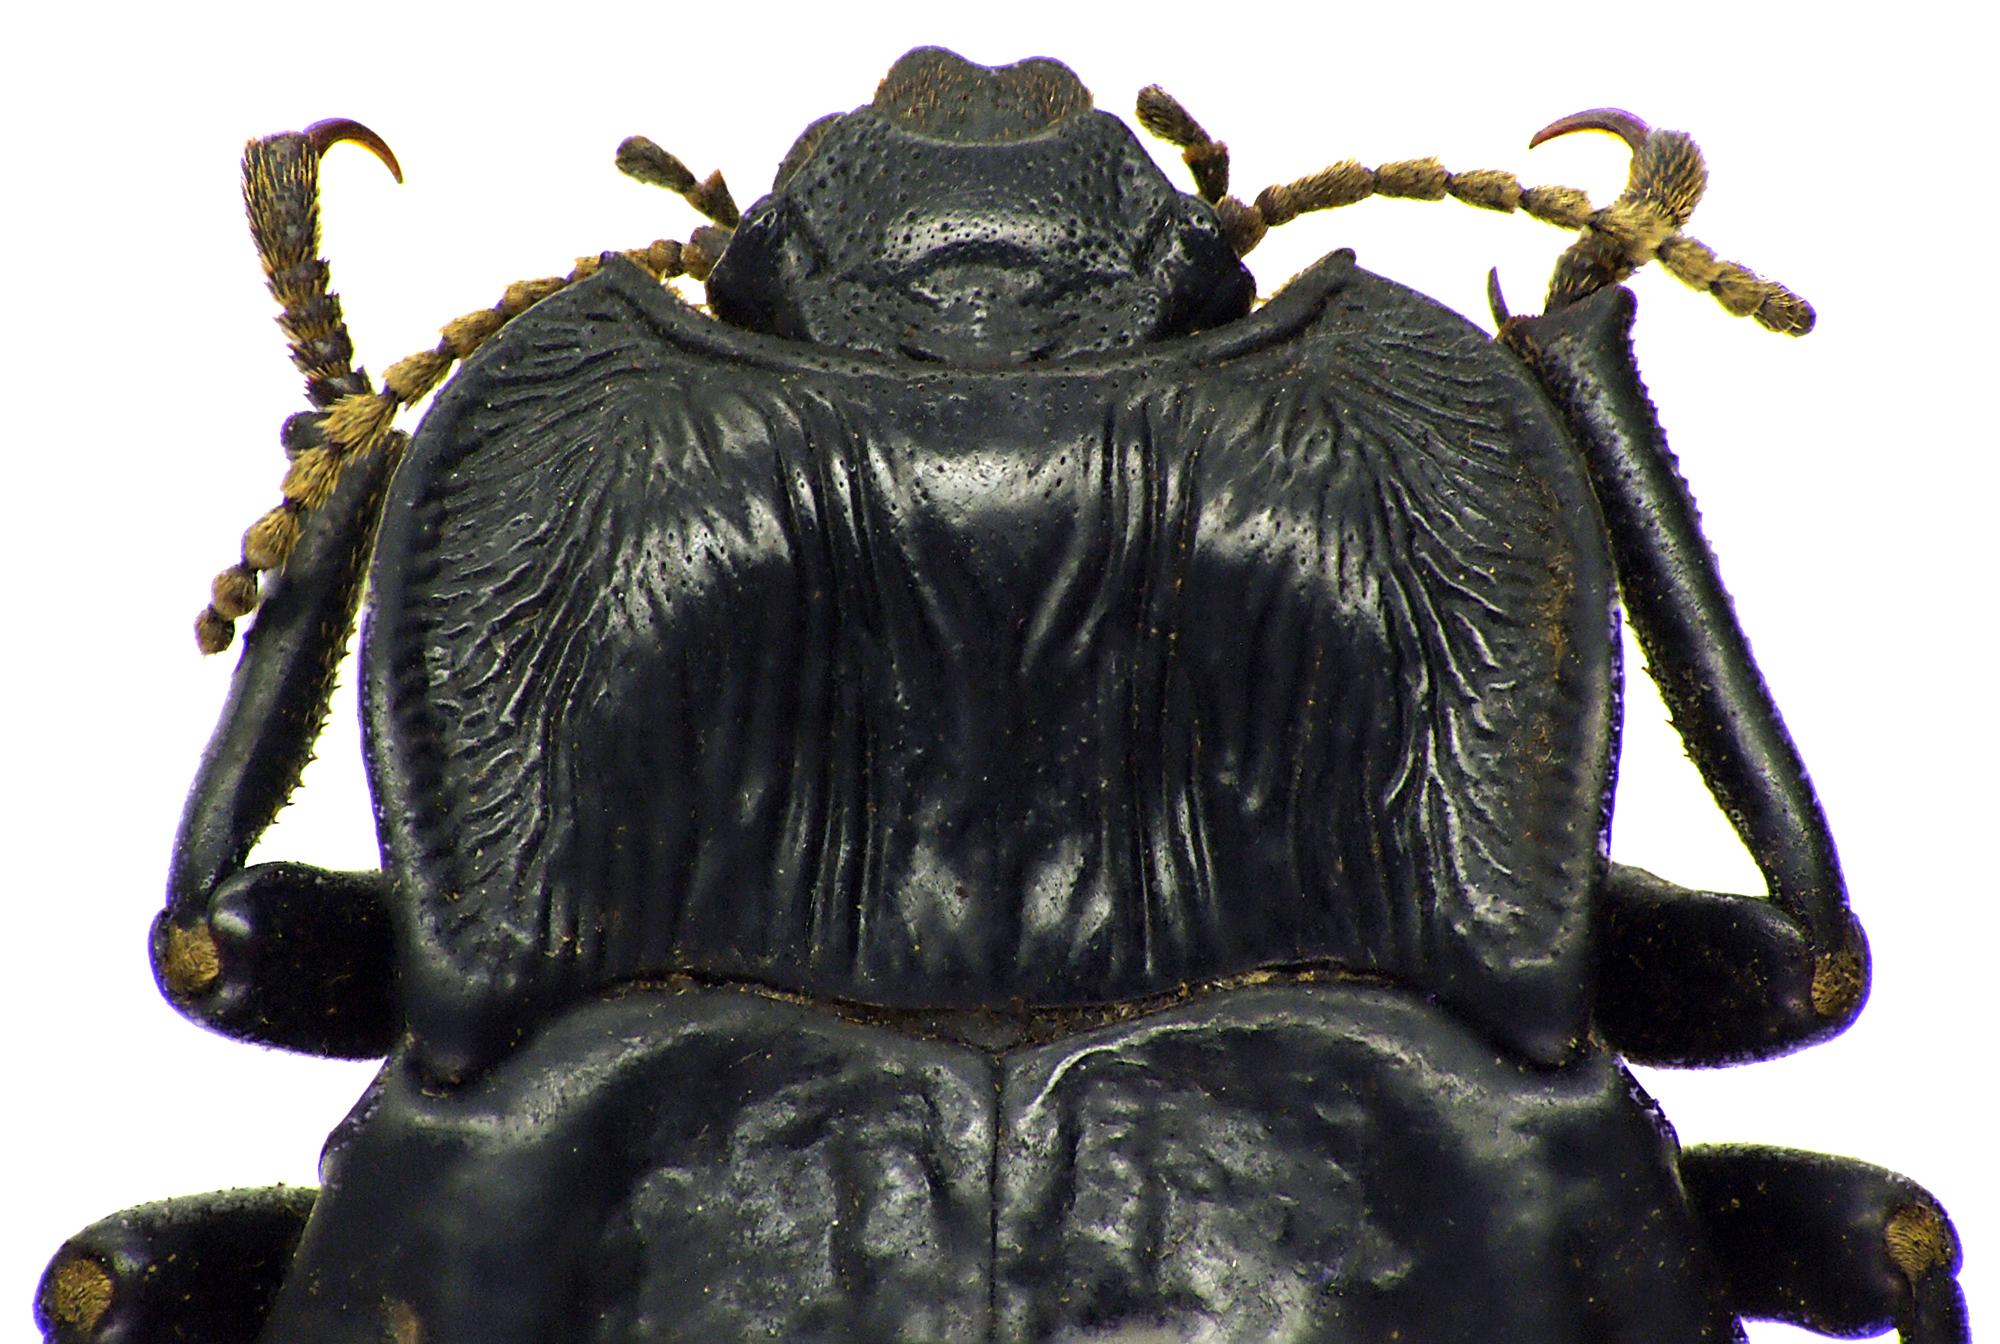 Epipedonota biramosa 76669cz76.jpg